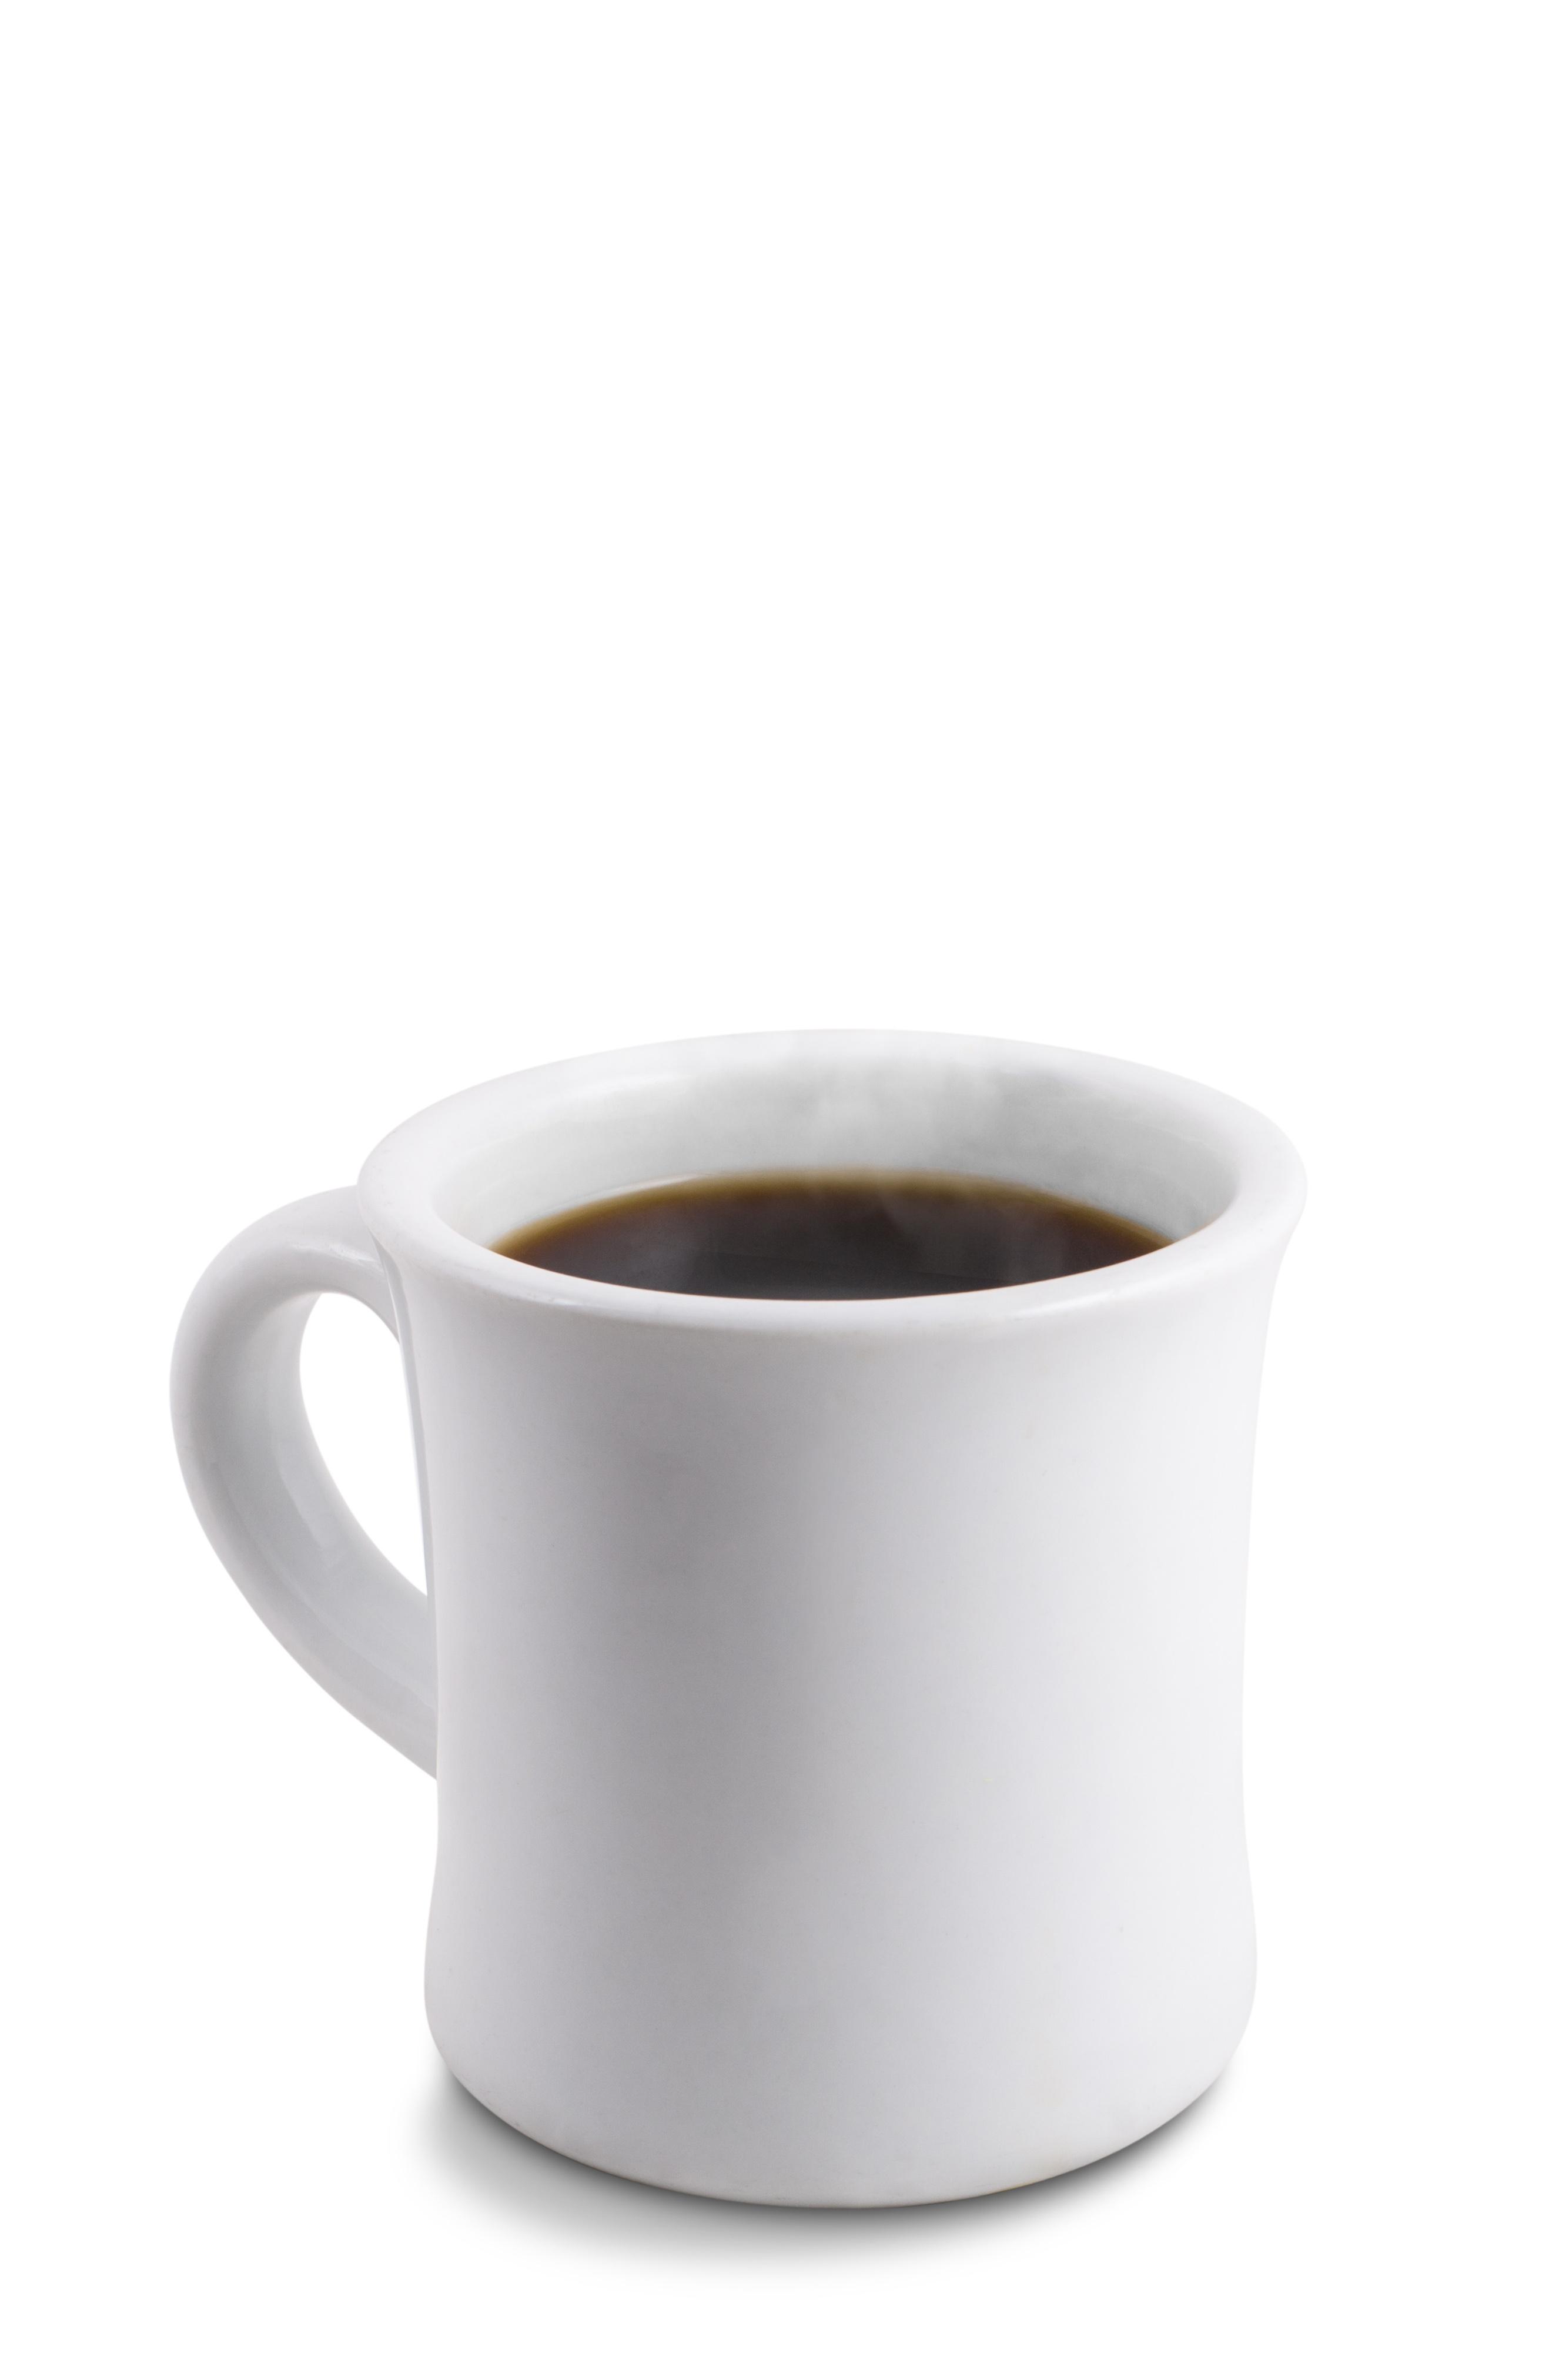 Creative Mug Vintagevelvets Hot Chocolate Drink 8 Recipe Ideas Printed Mugs Coffee Mugs Photo